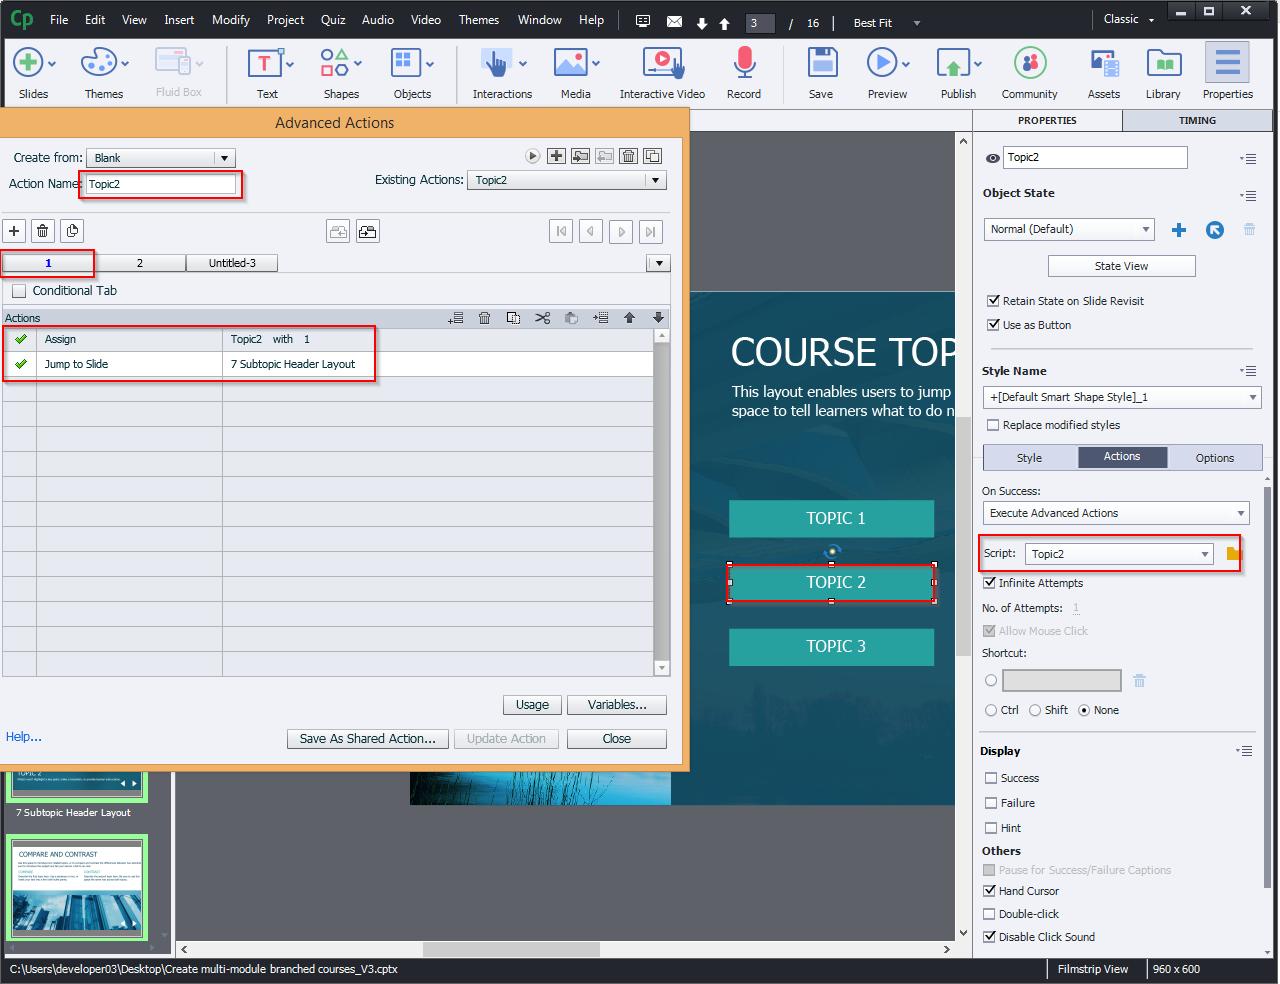 Create multi-module branched courses 10.3